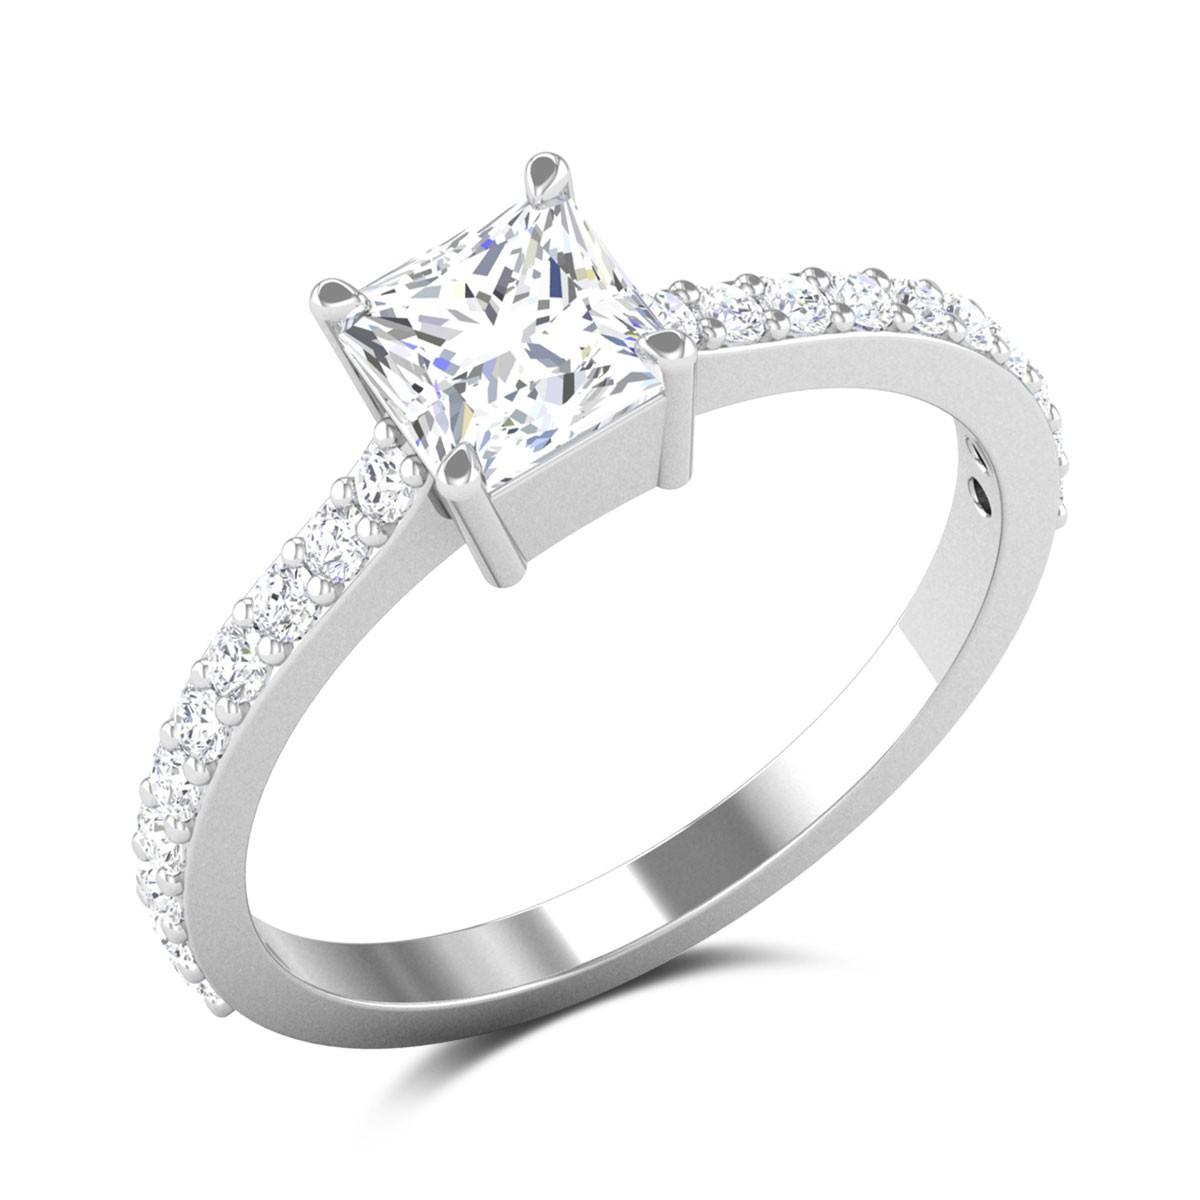 Osborne Princess Cut Solitaire Ring